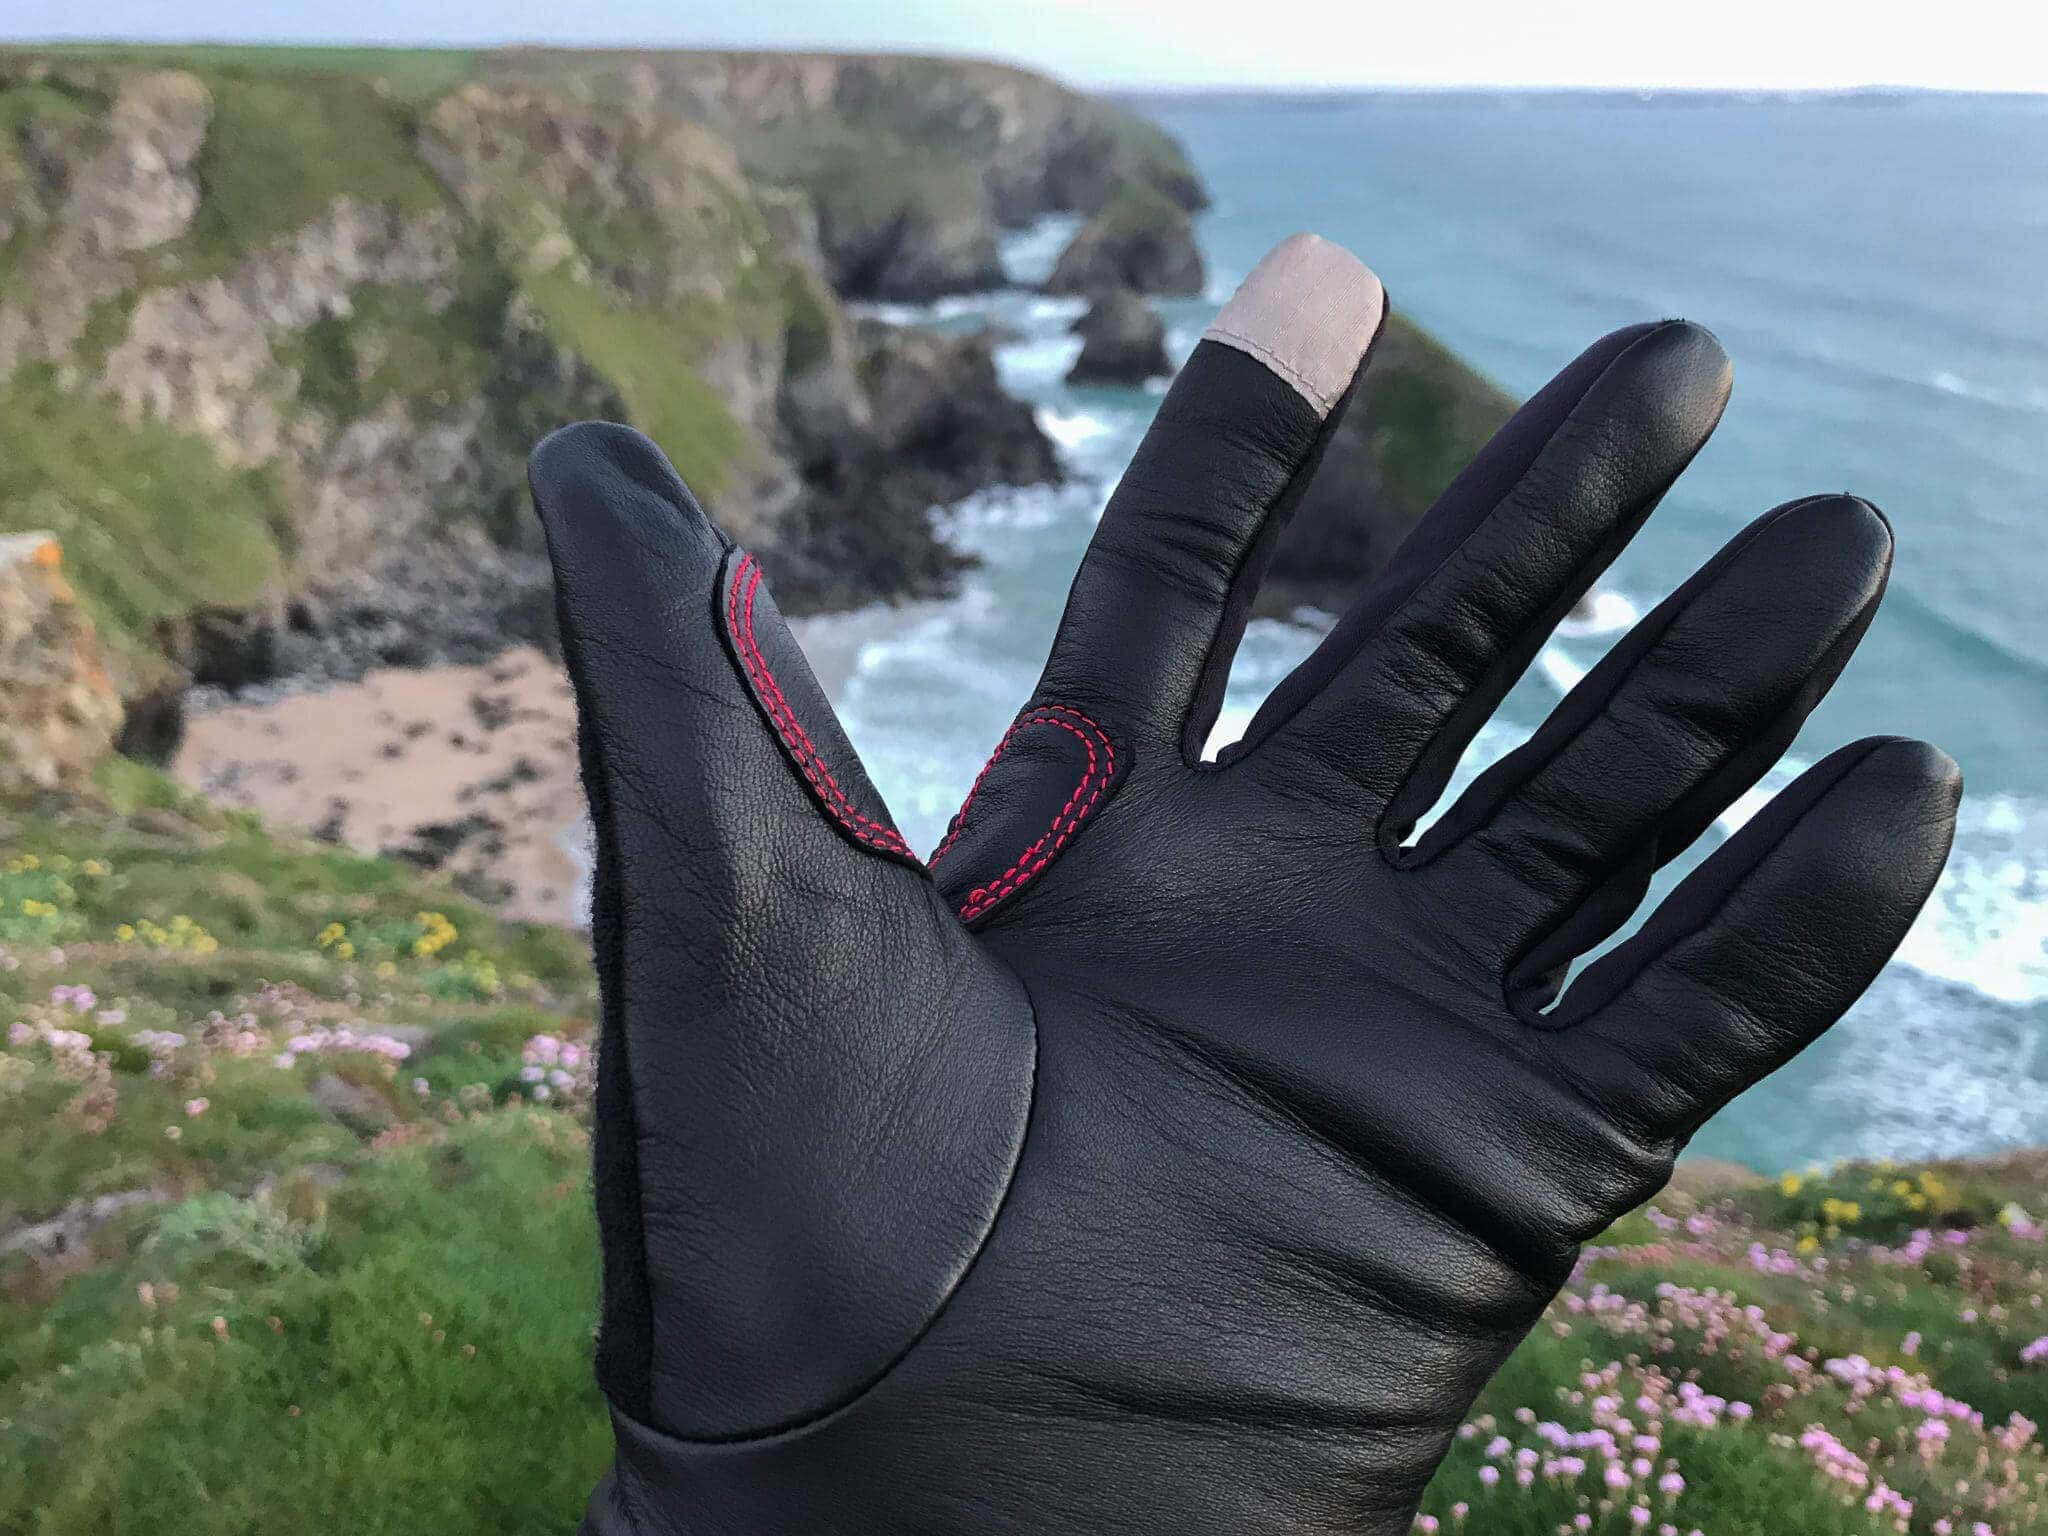 Francesco-Gola-Heat-Company-Gloves-Durable-Liner-5